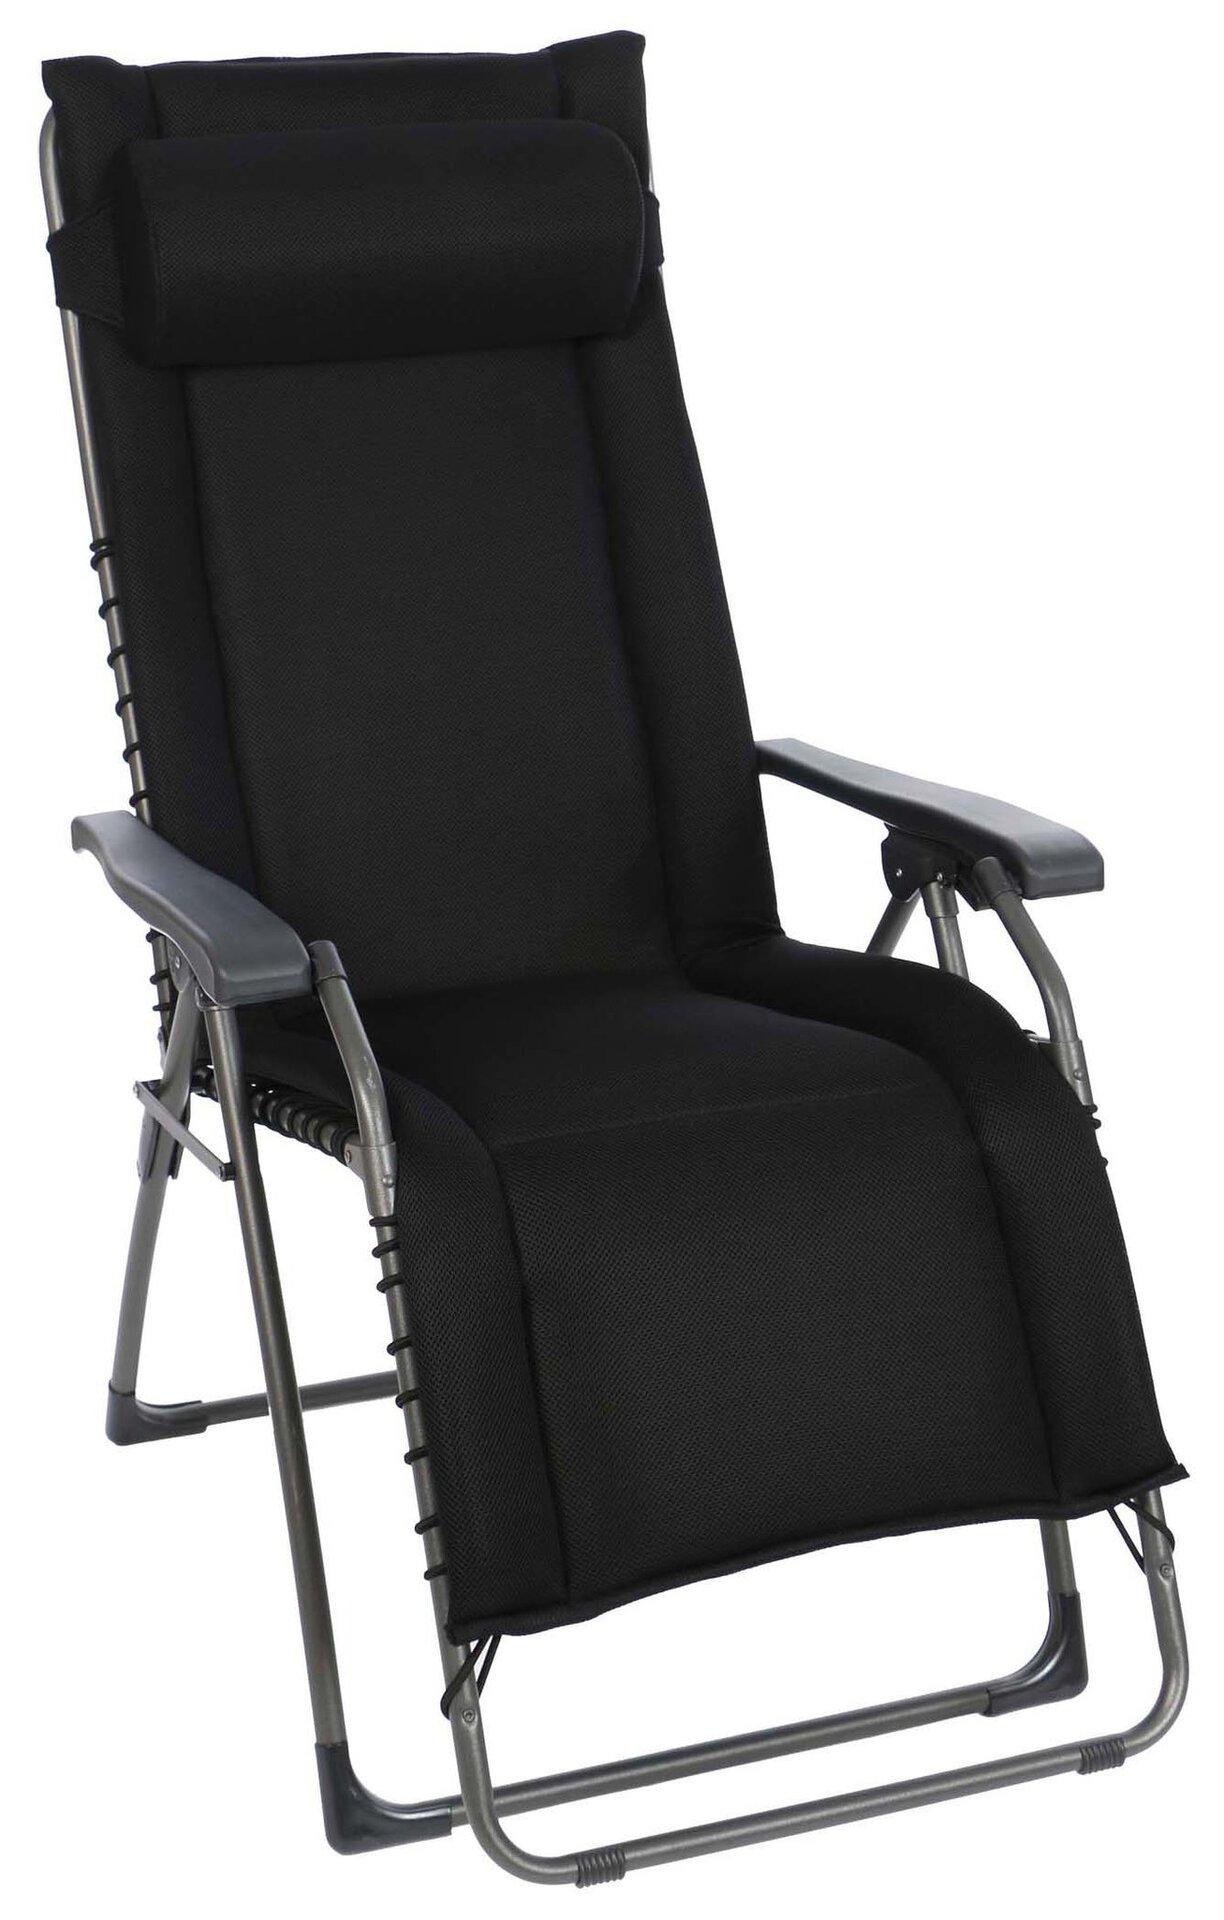 Relaxsessel OASI Sungörl Textil schwarz 73 x 14 x 111 cm